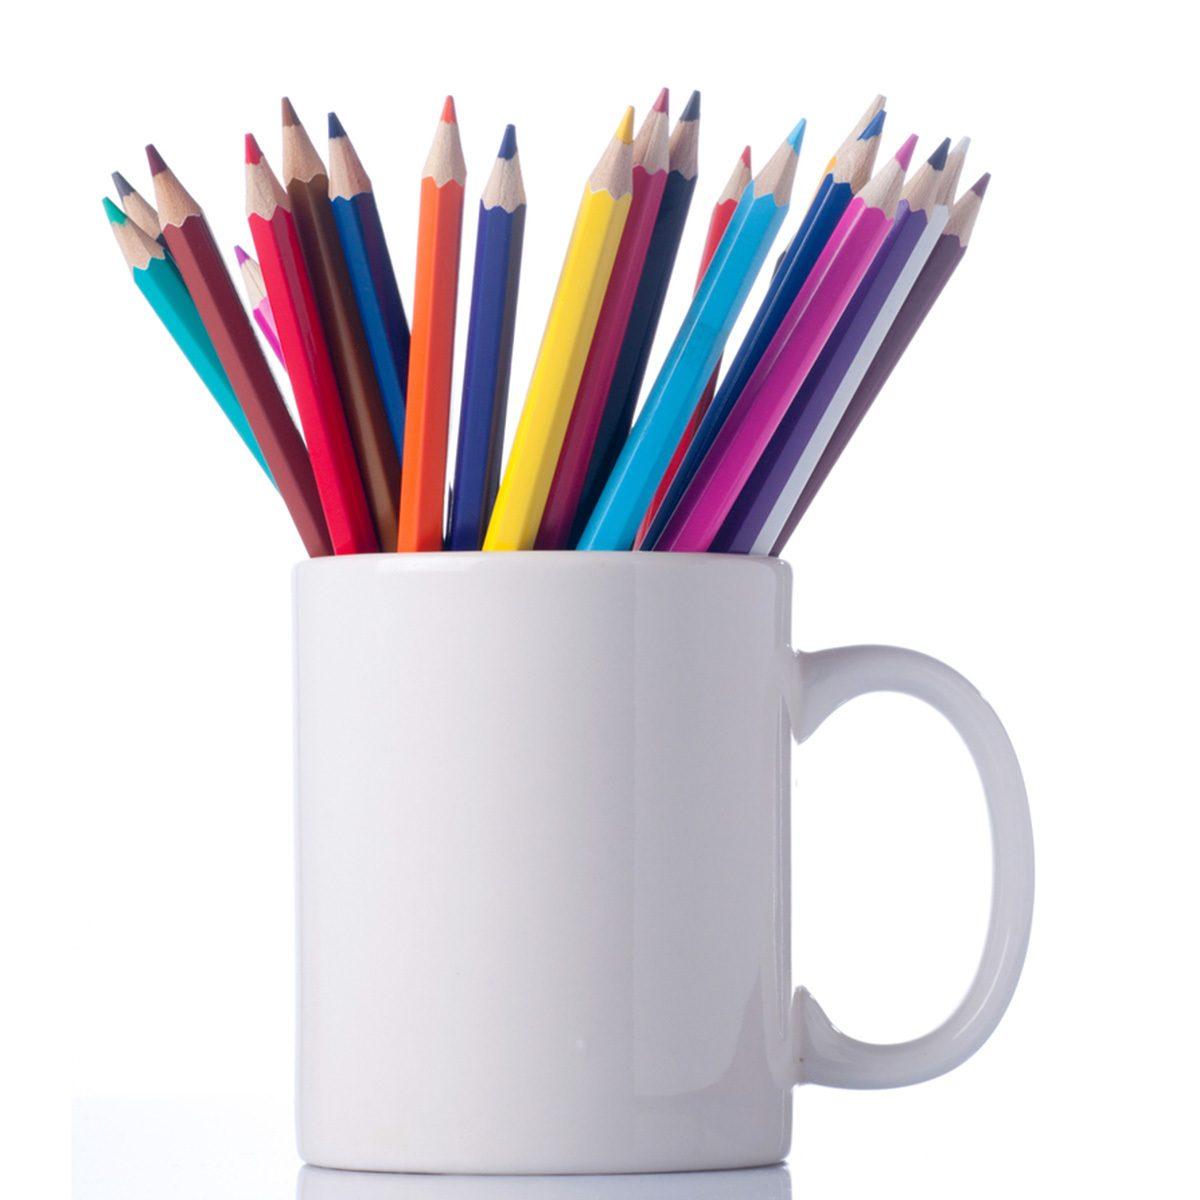 Use Those Mugs